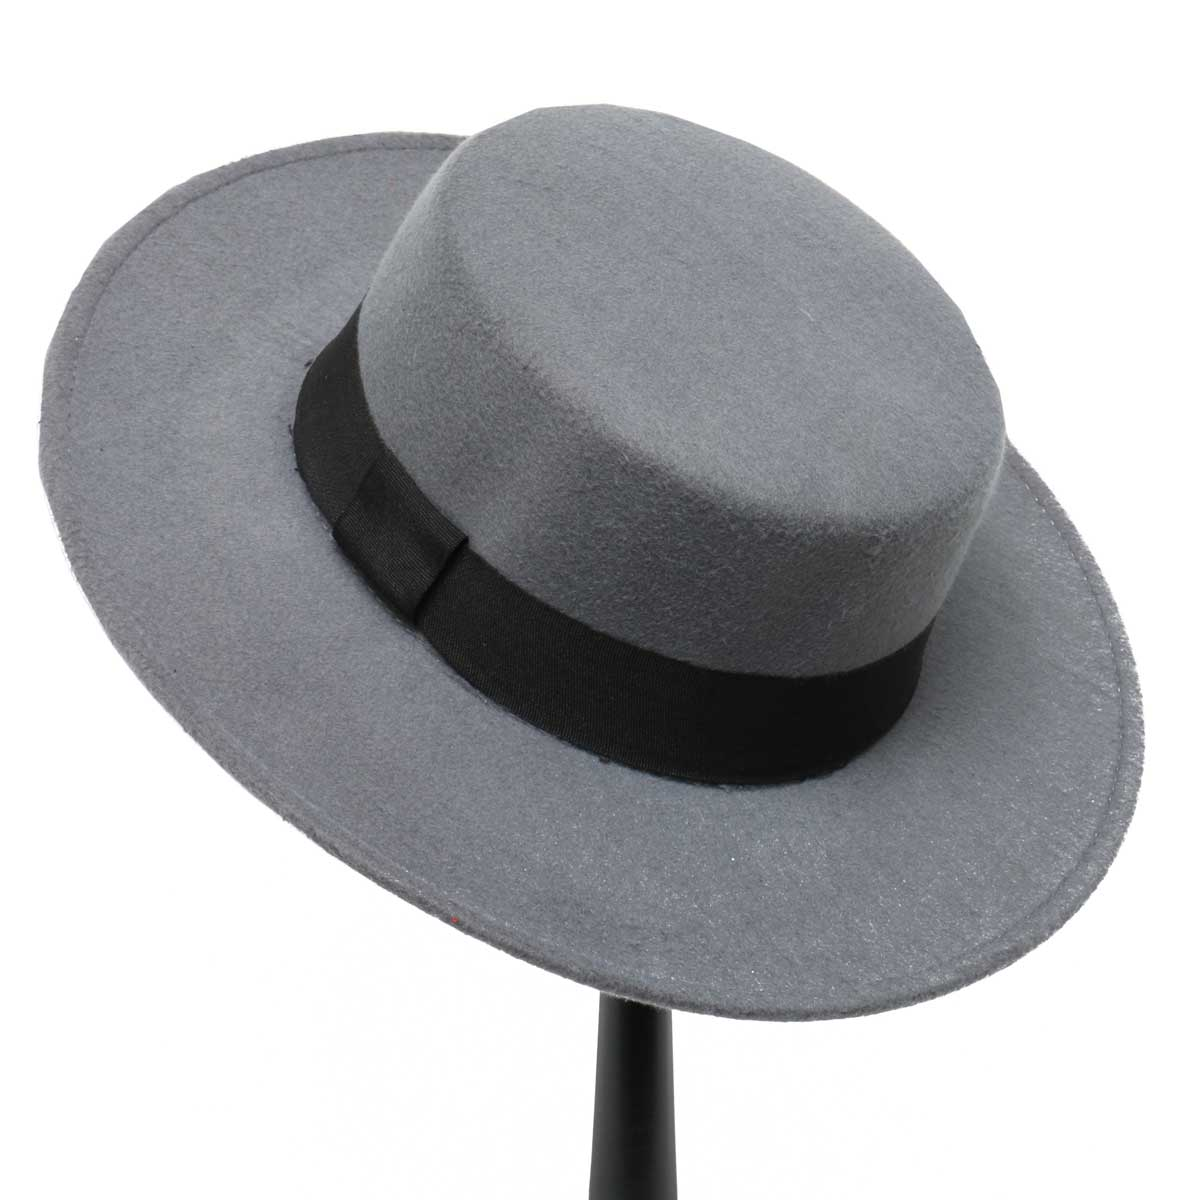 GREY GAUCHO HAT 50sp